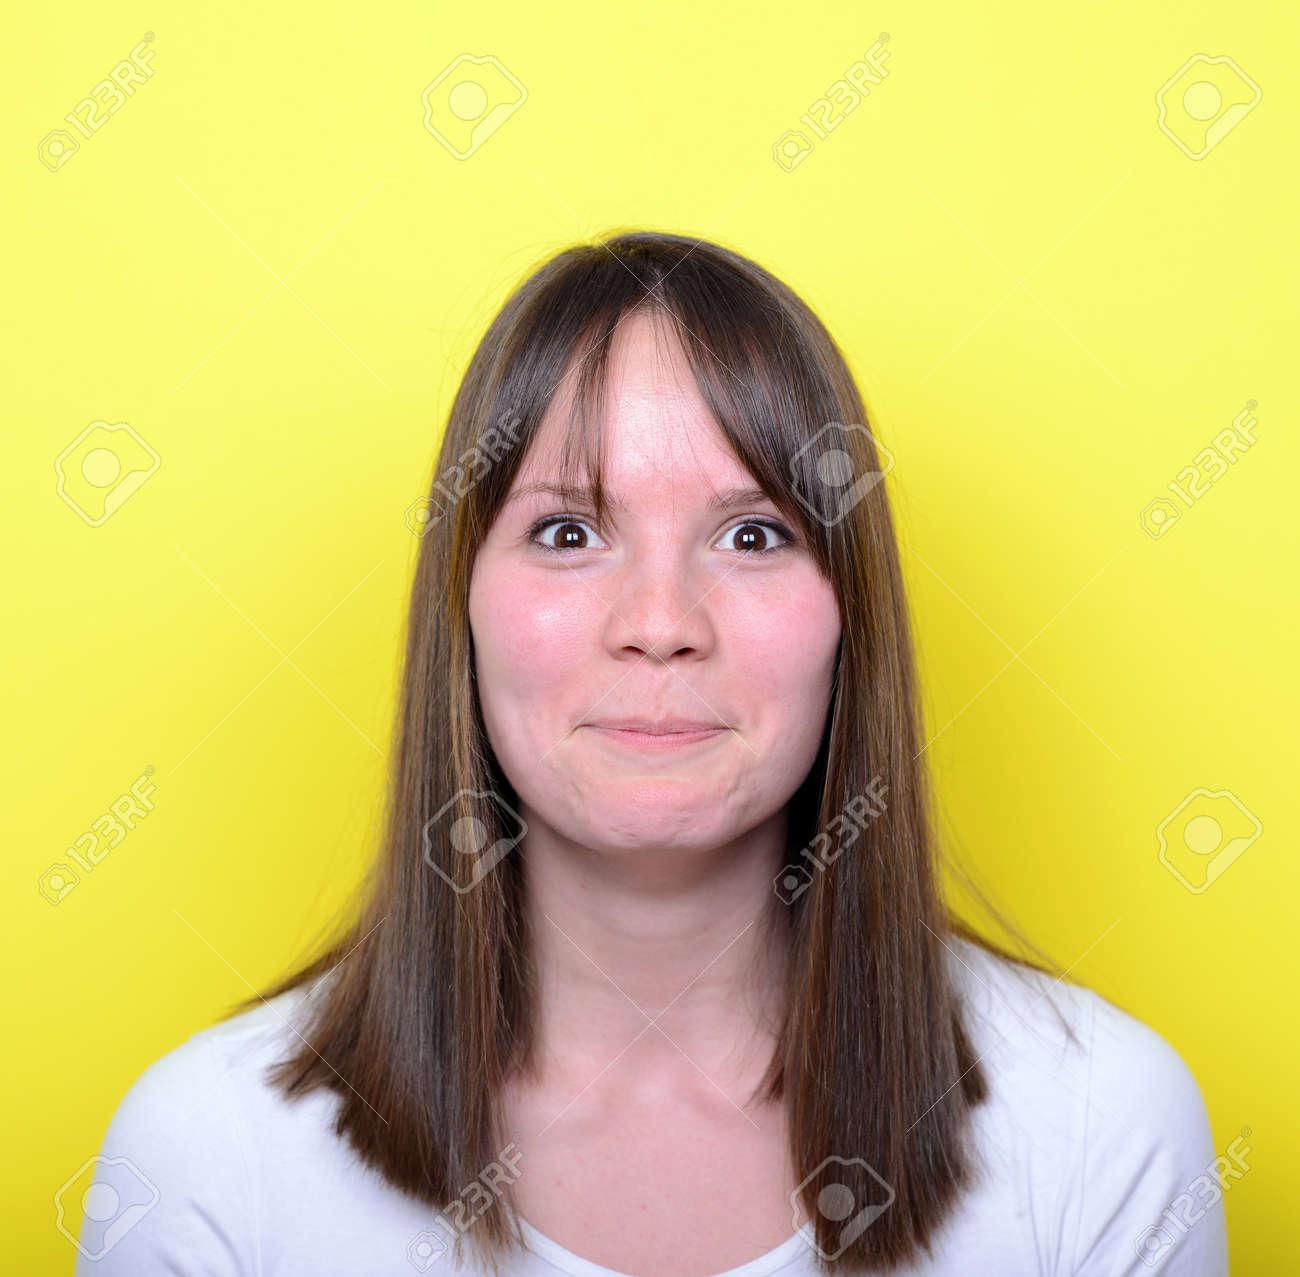 Portrait of girl blushing - 27774153